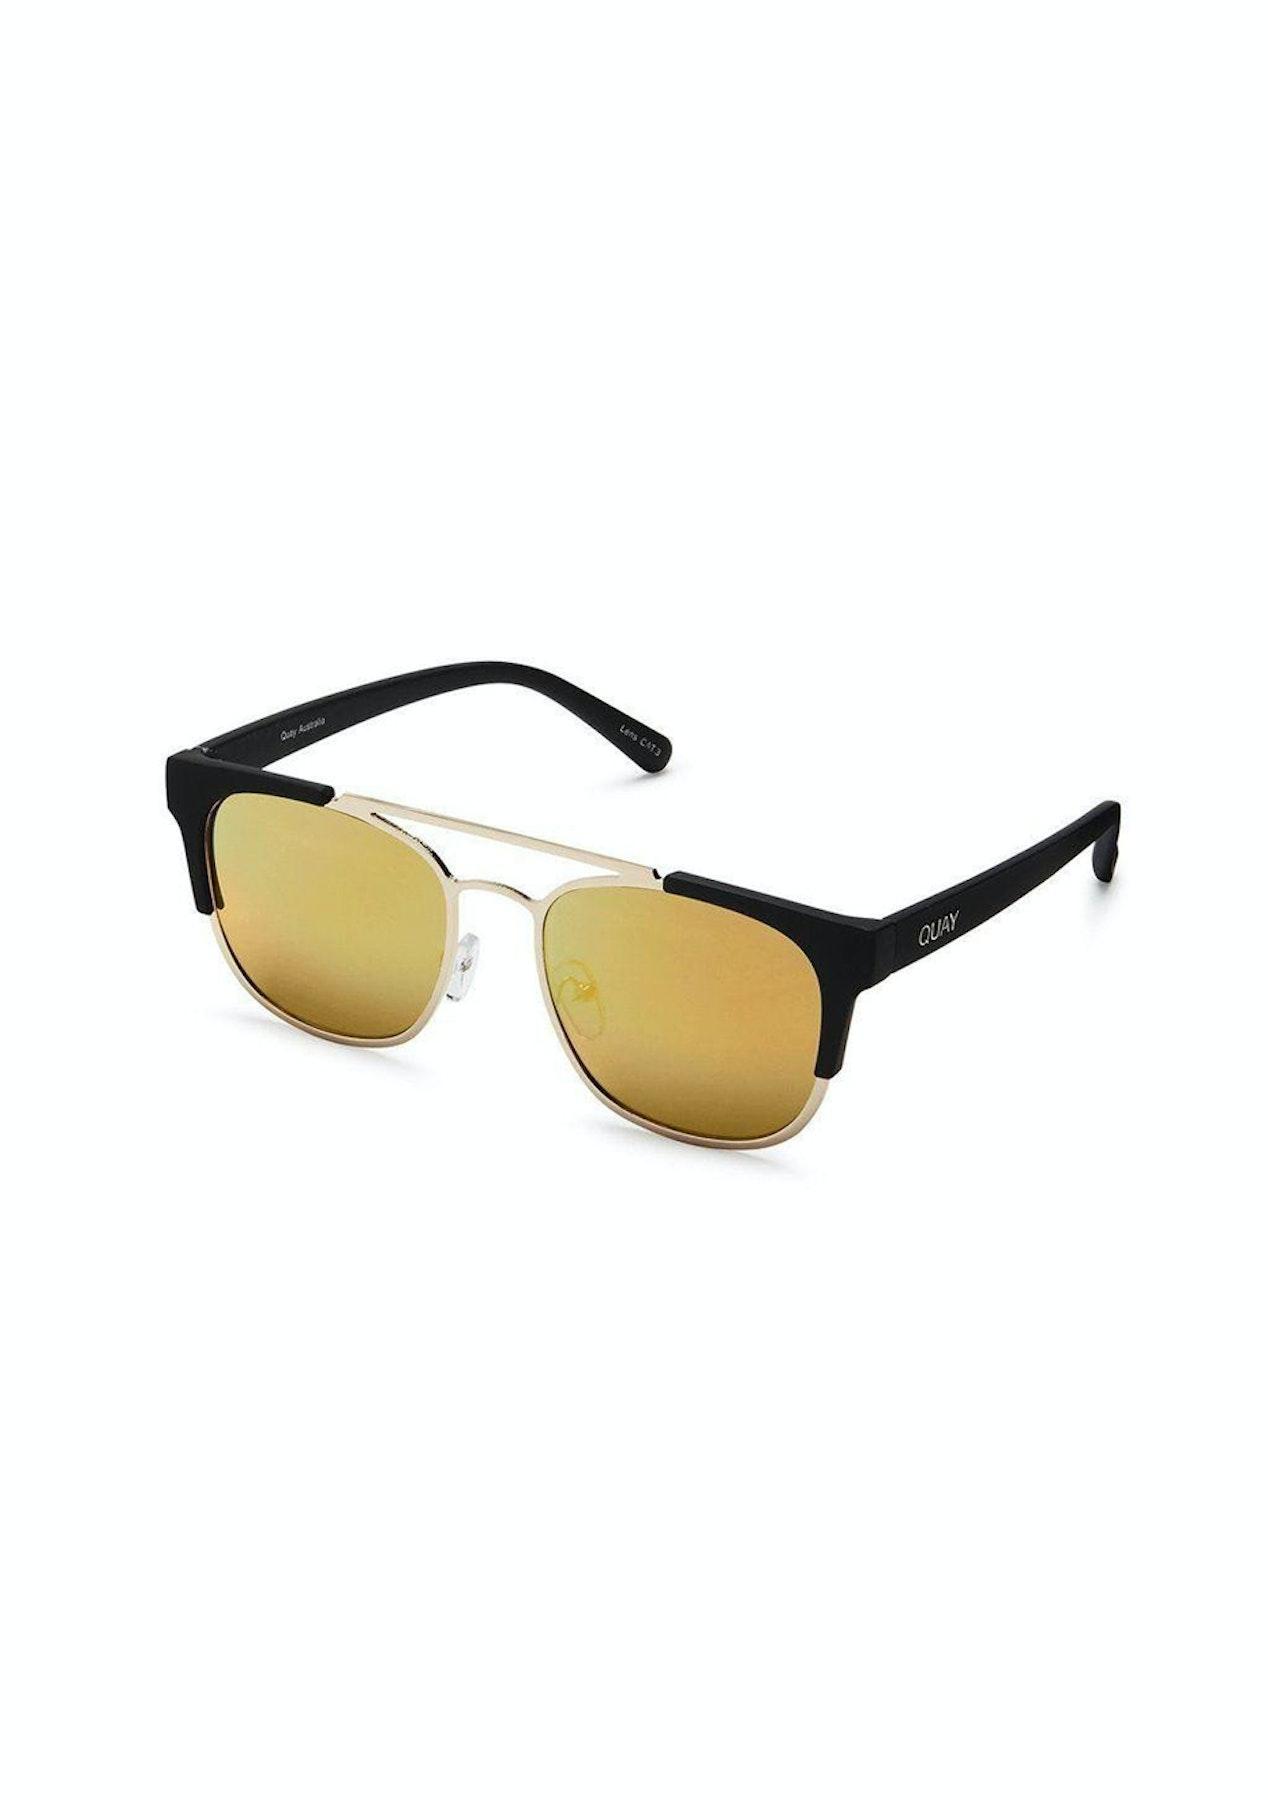 9aefbf0406 Quay Australia High and Dry Sunglasses - Quay Sunglasses   More from  9.95  - Onceit